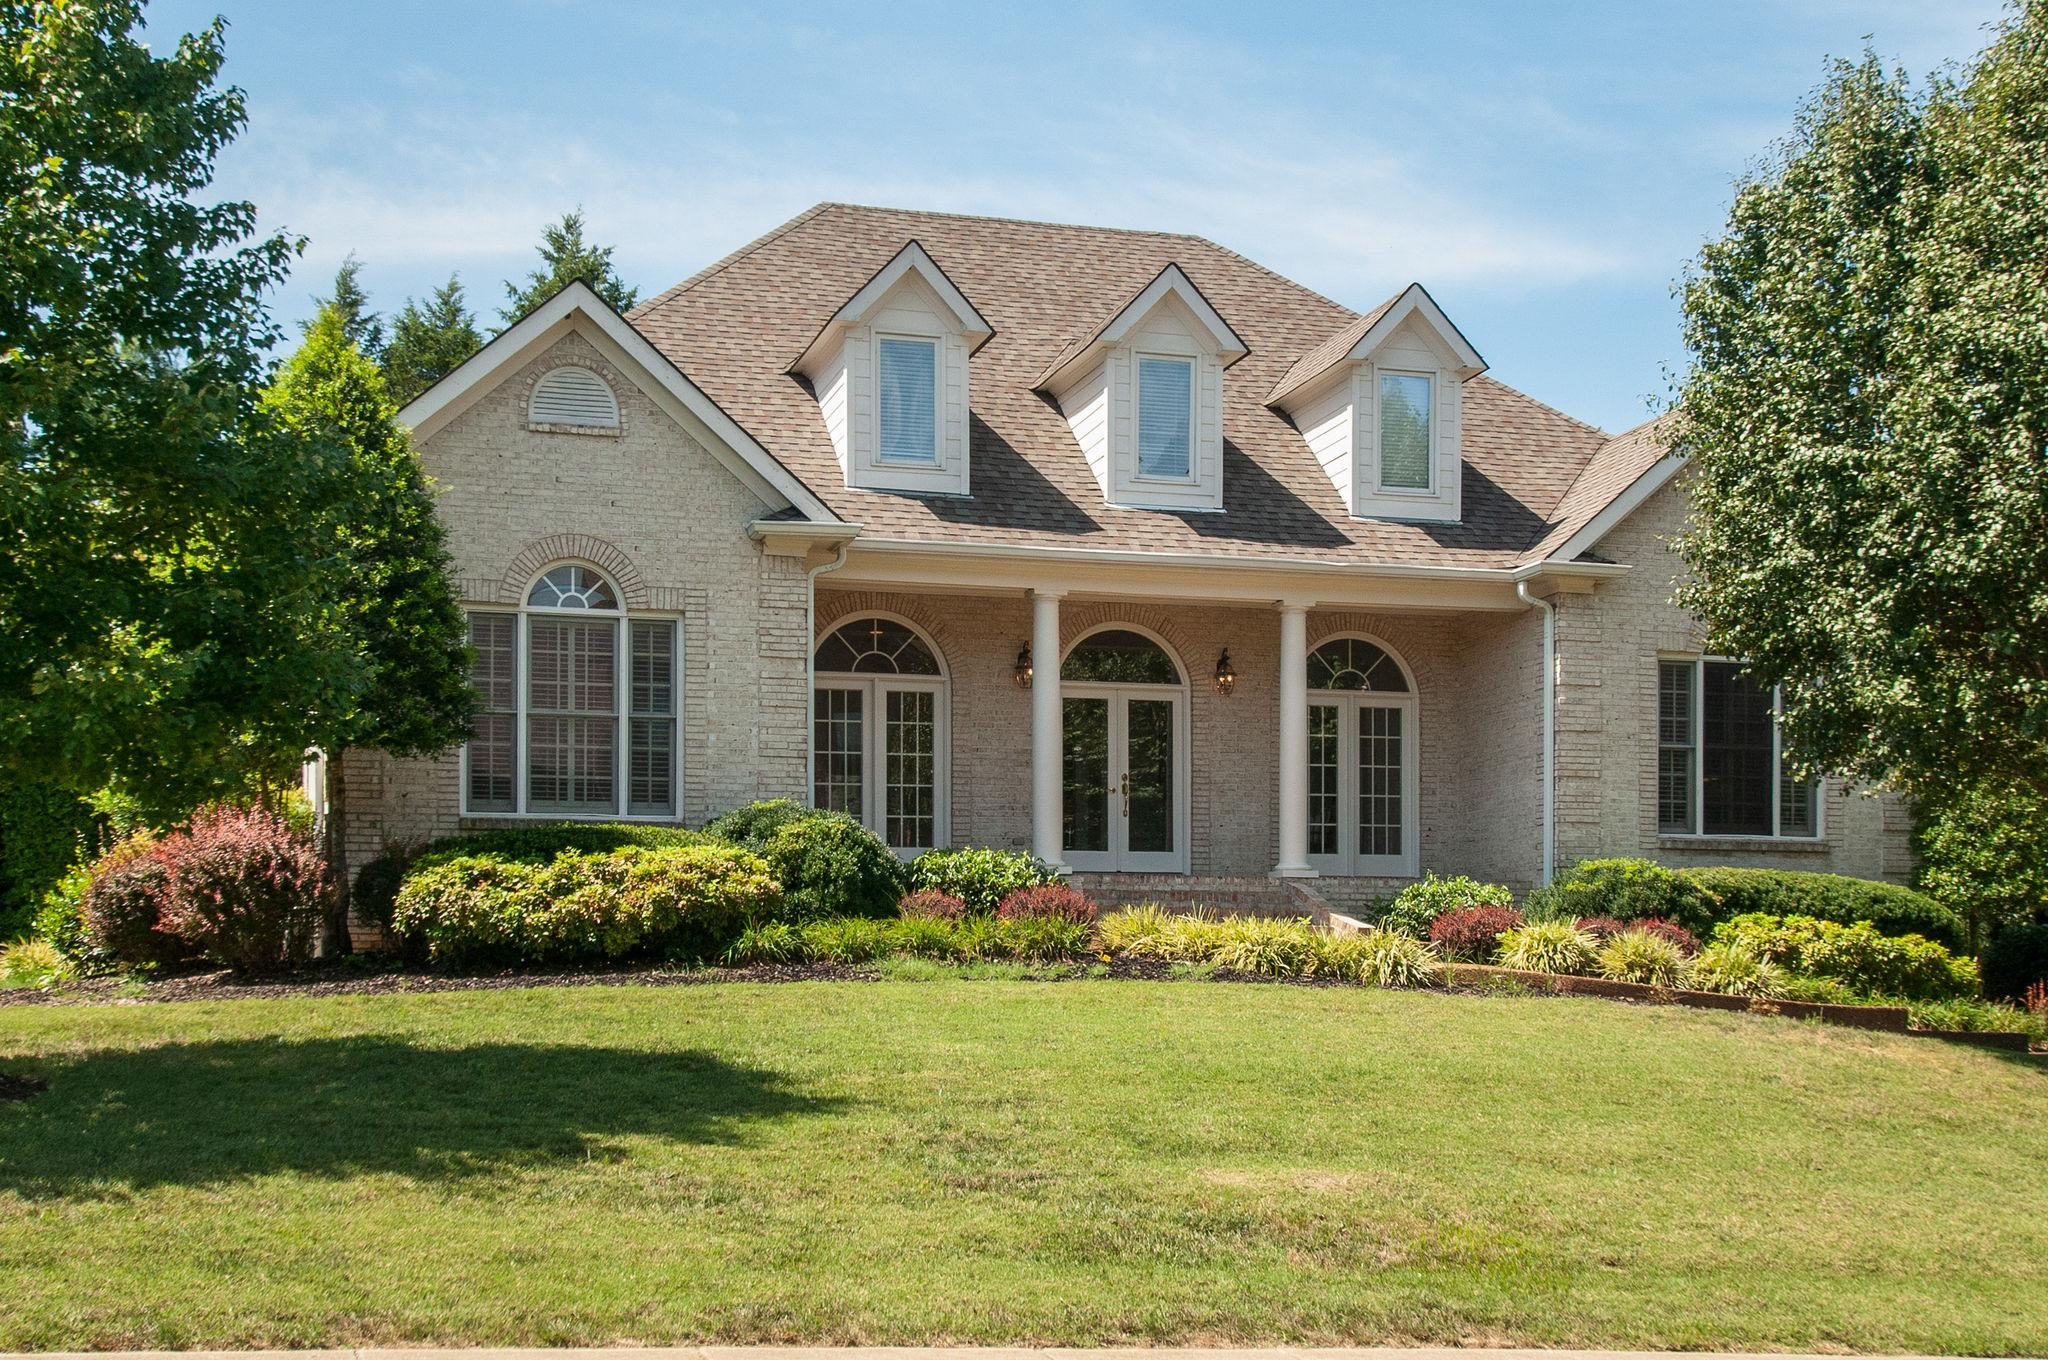 1055 Stonebridge Park Dr, Franklin, TN 37069 - Franklin, TN real estate listing